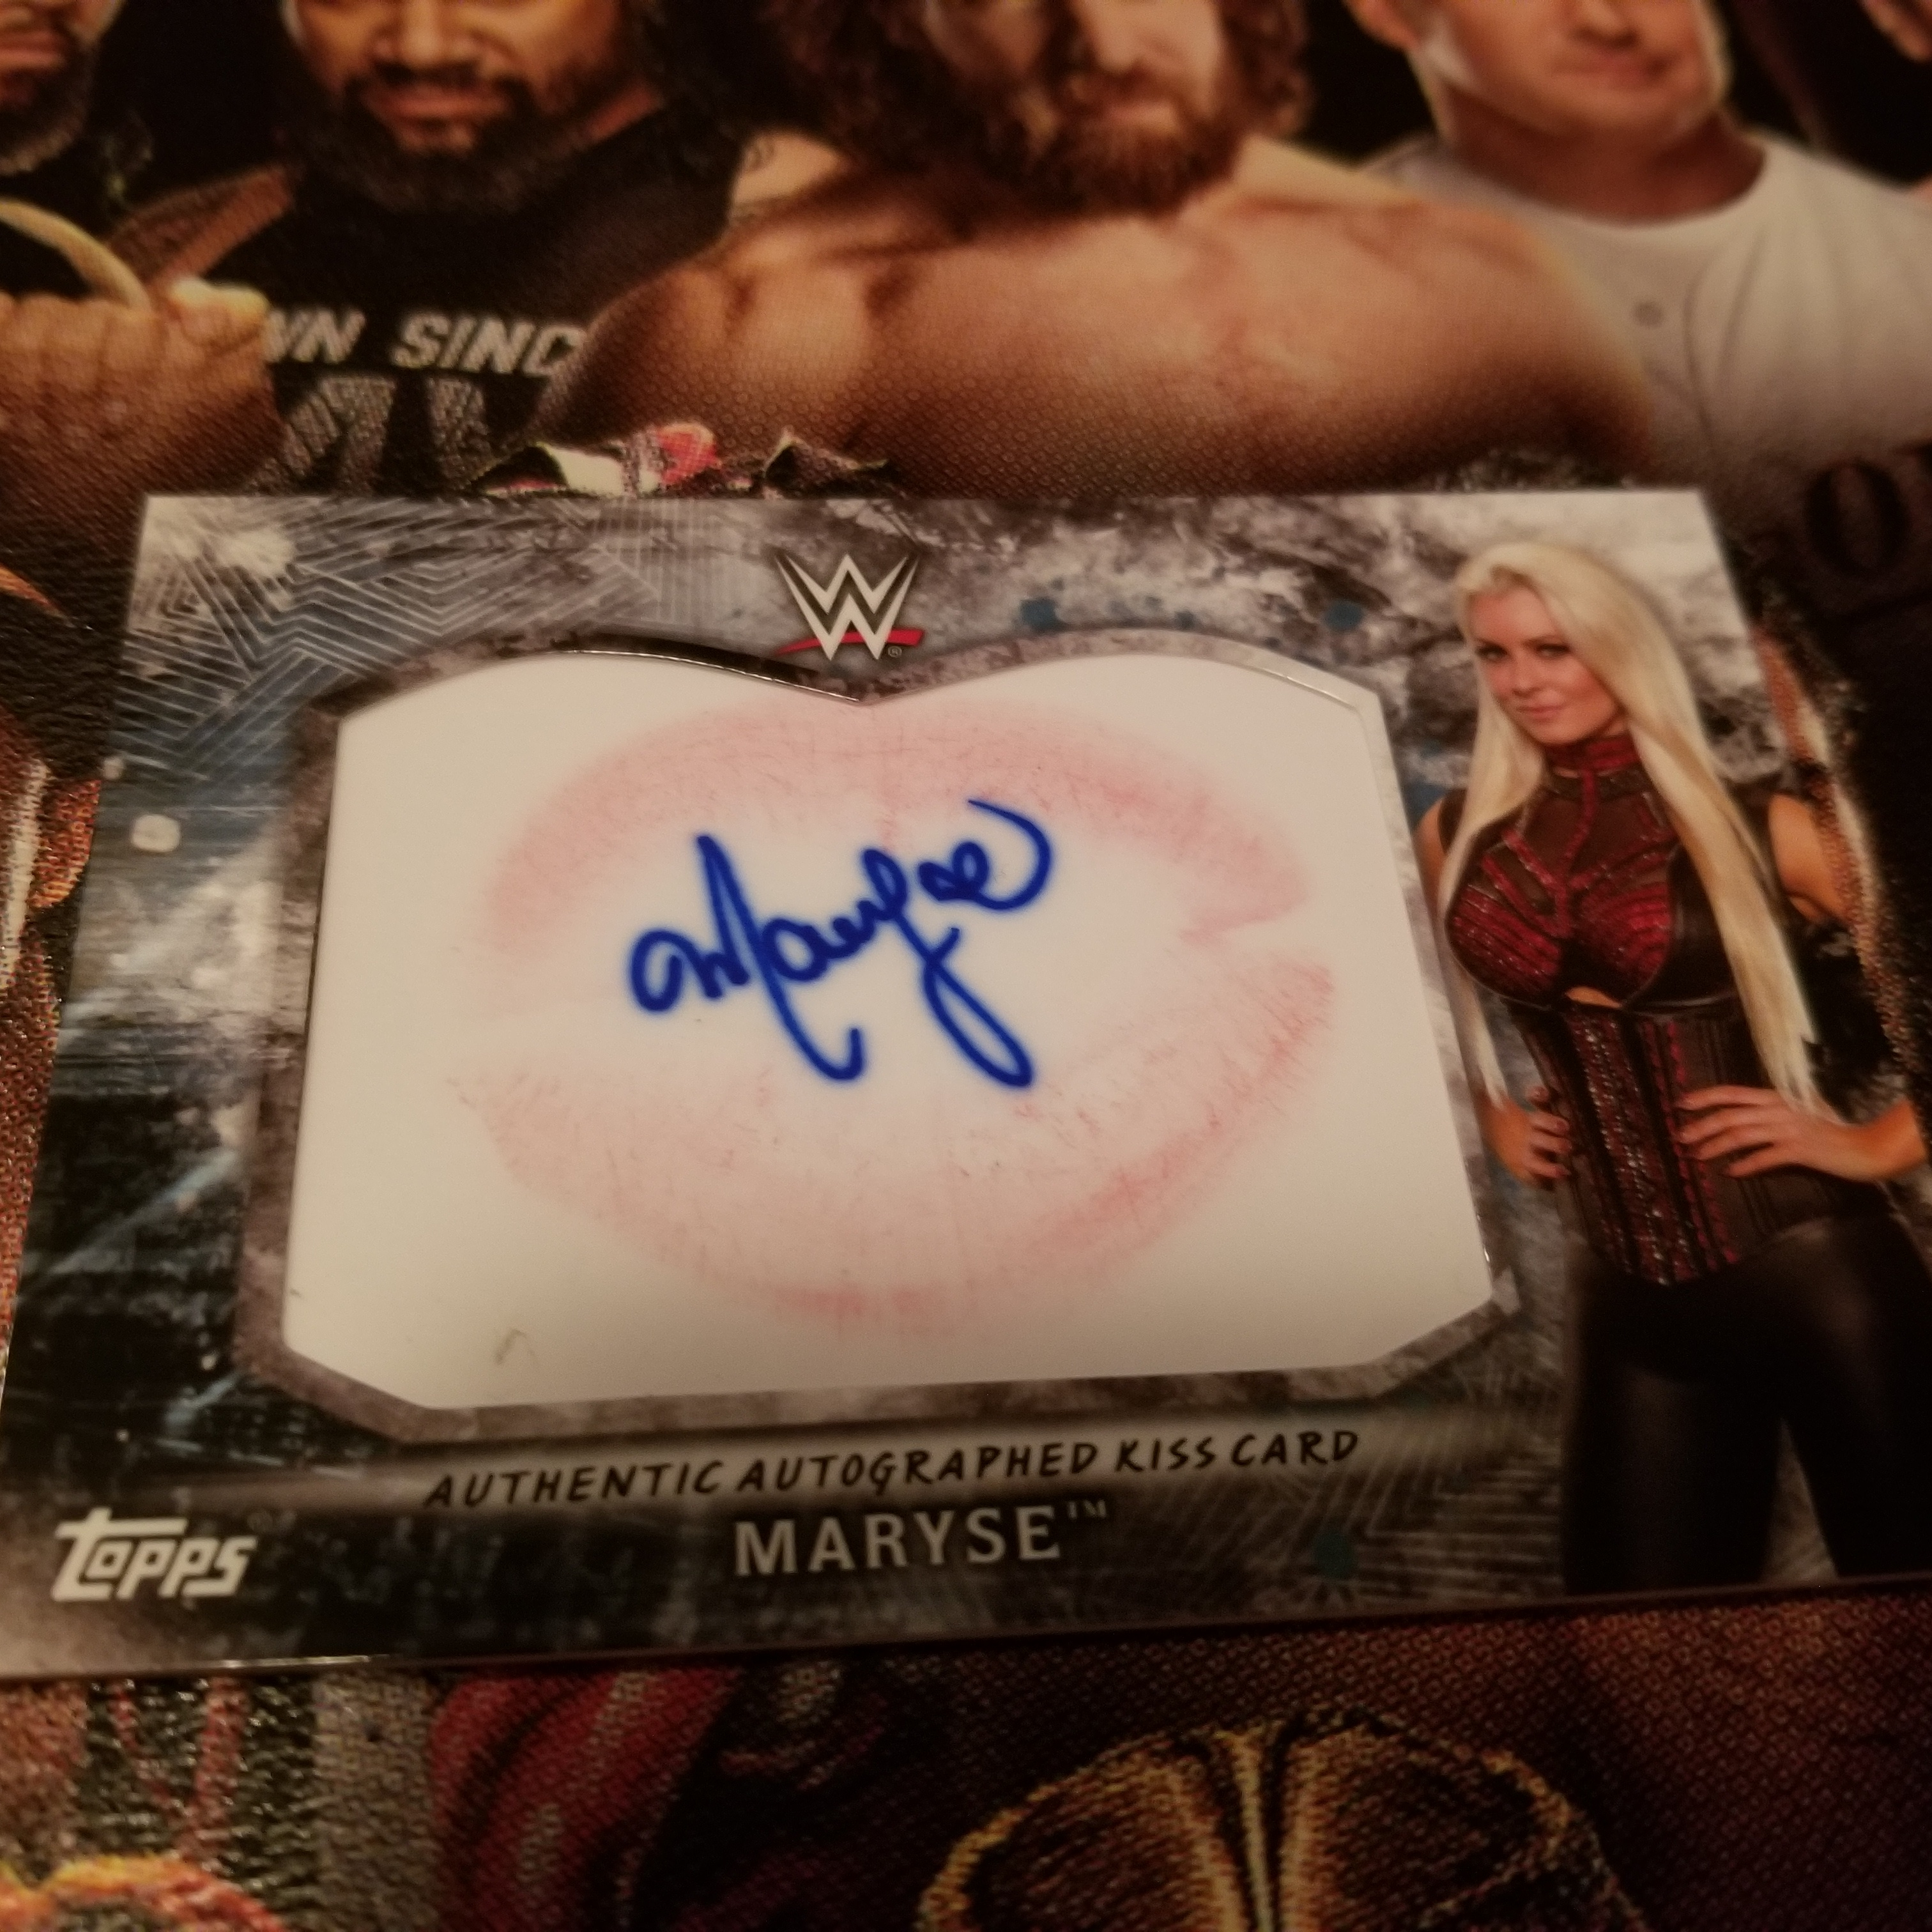 Maryse signed kiss card